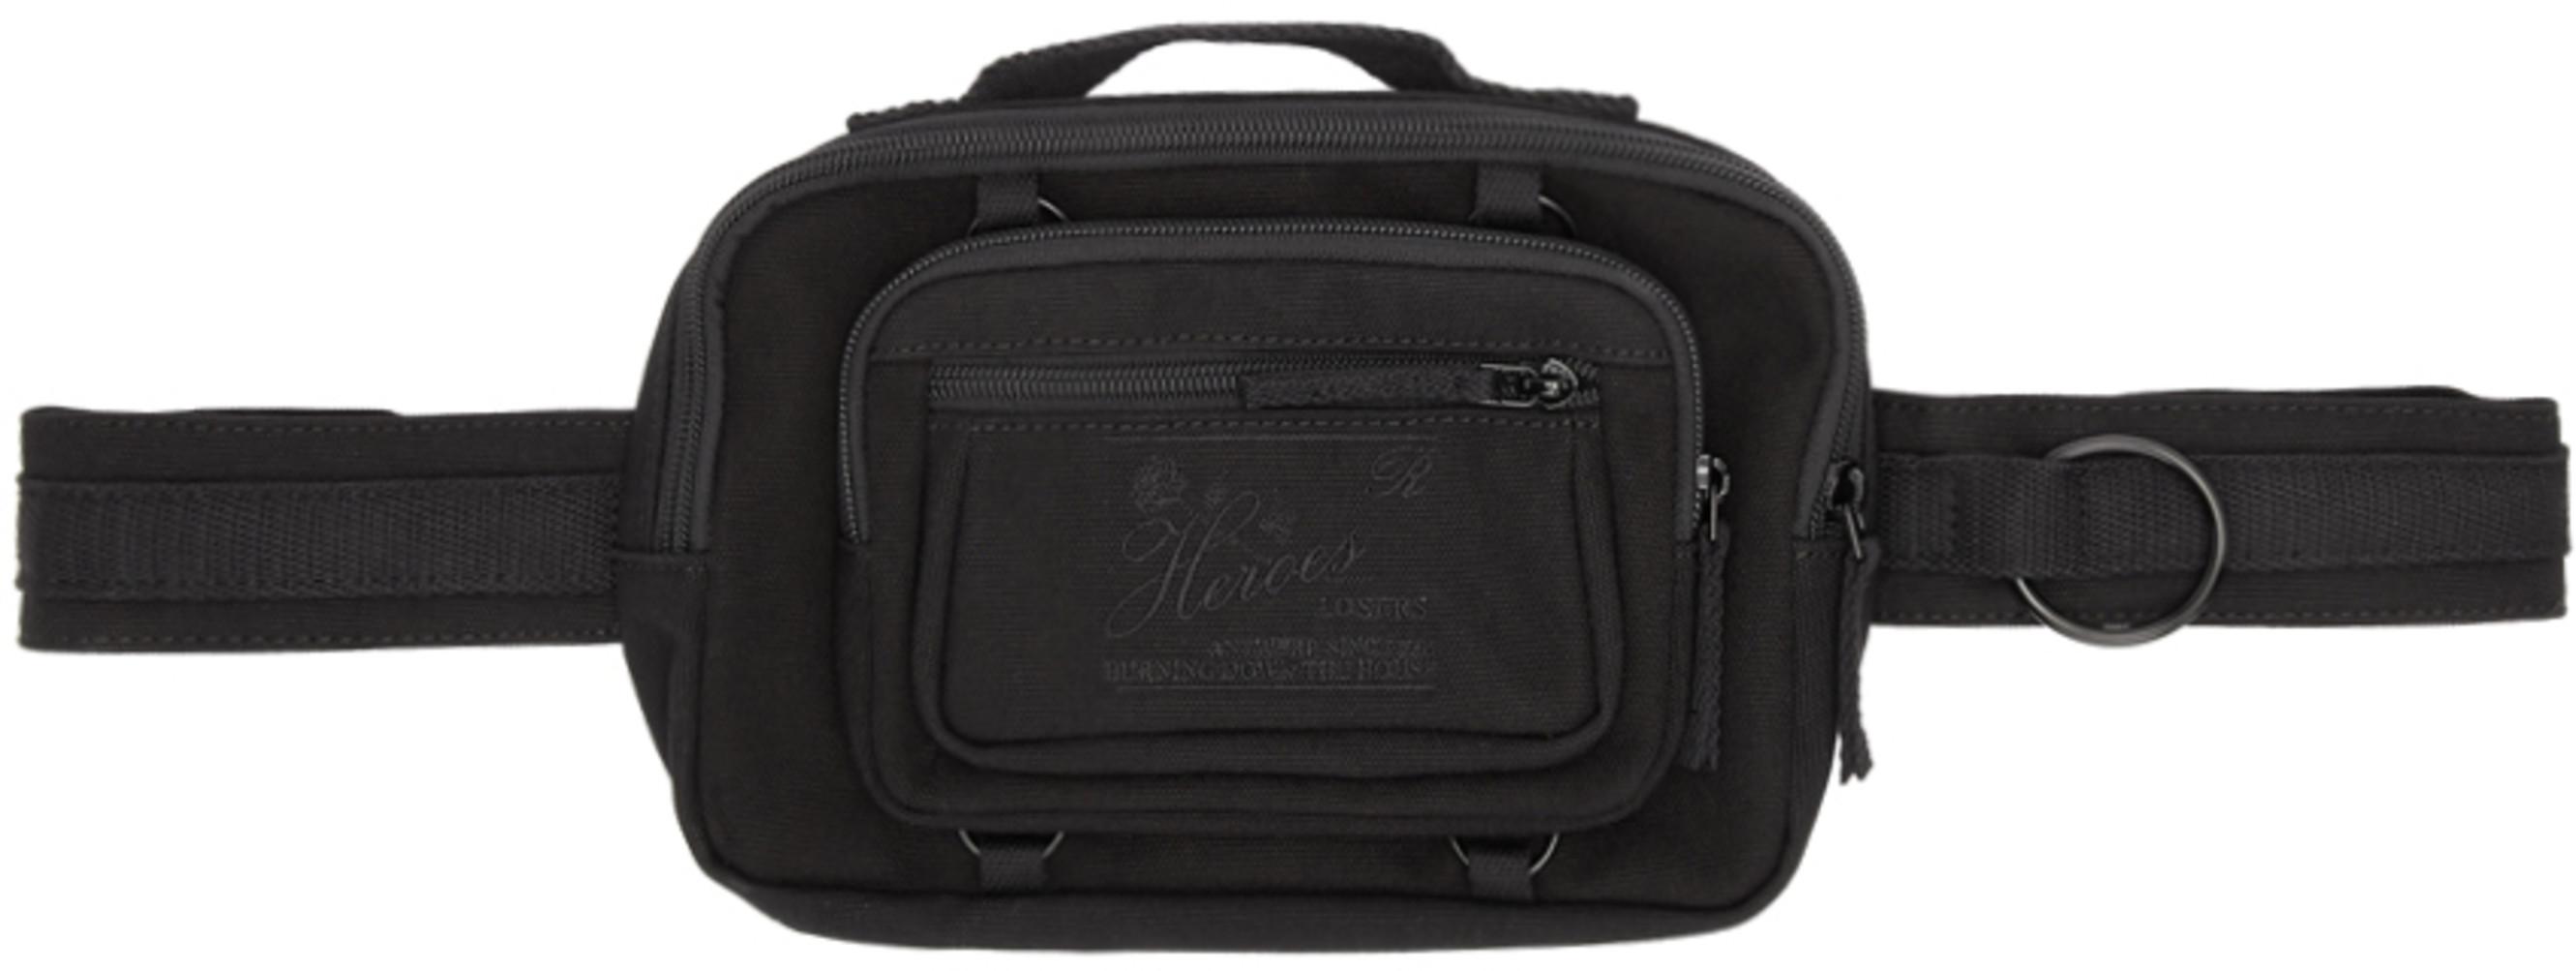 9b1f79ccf1bbd Designer pouches for Women | SSENSE